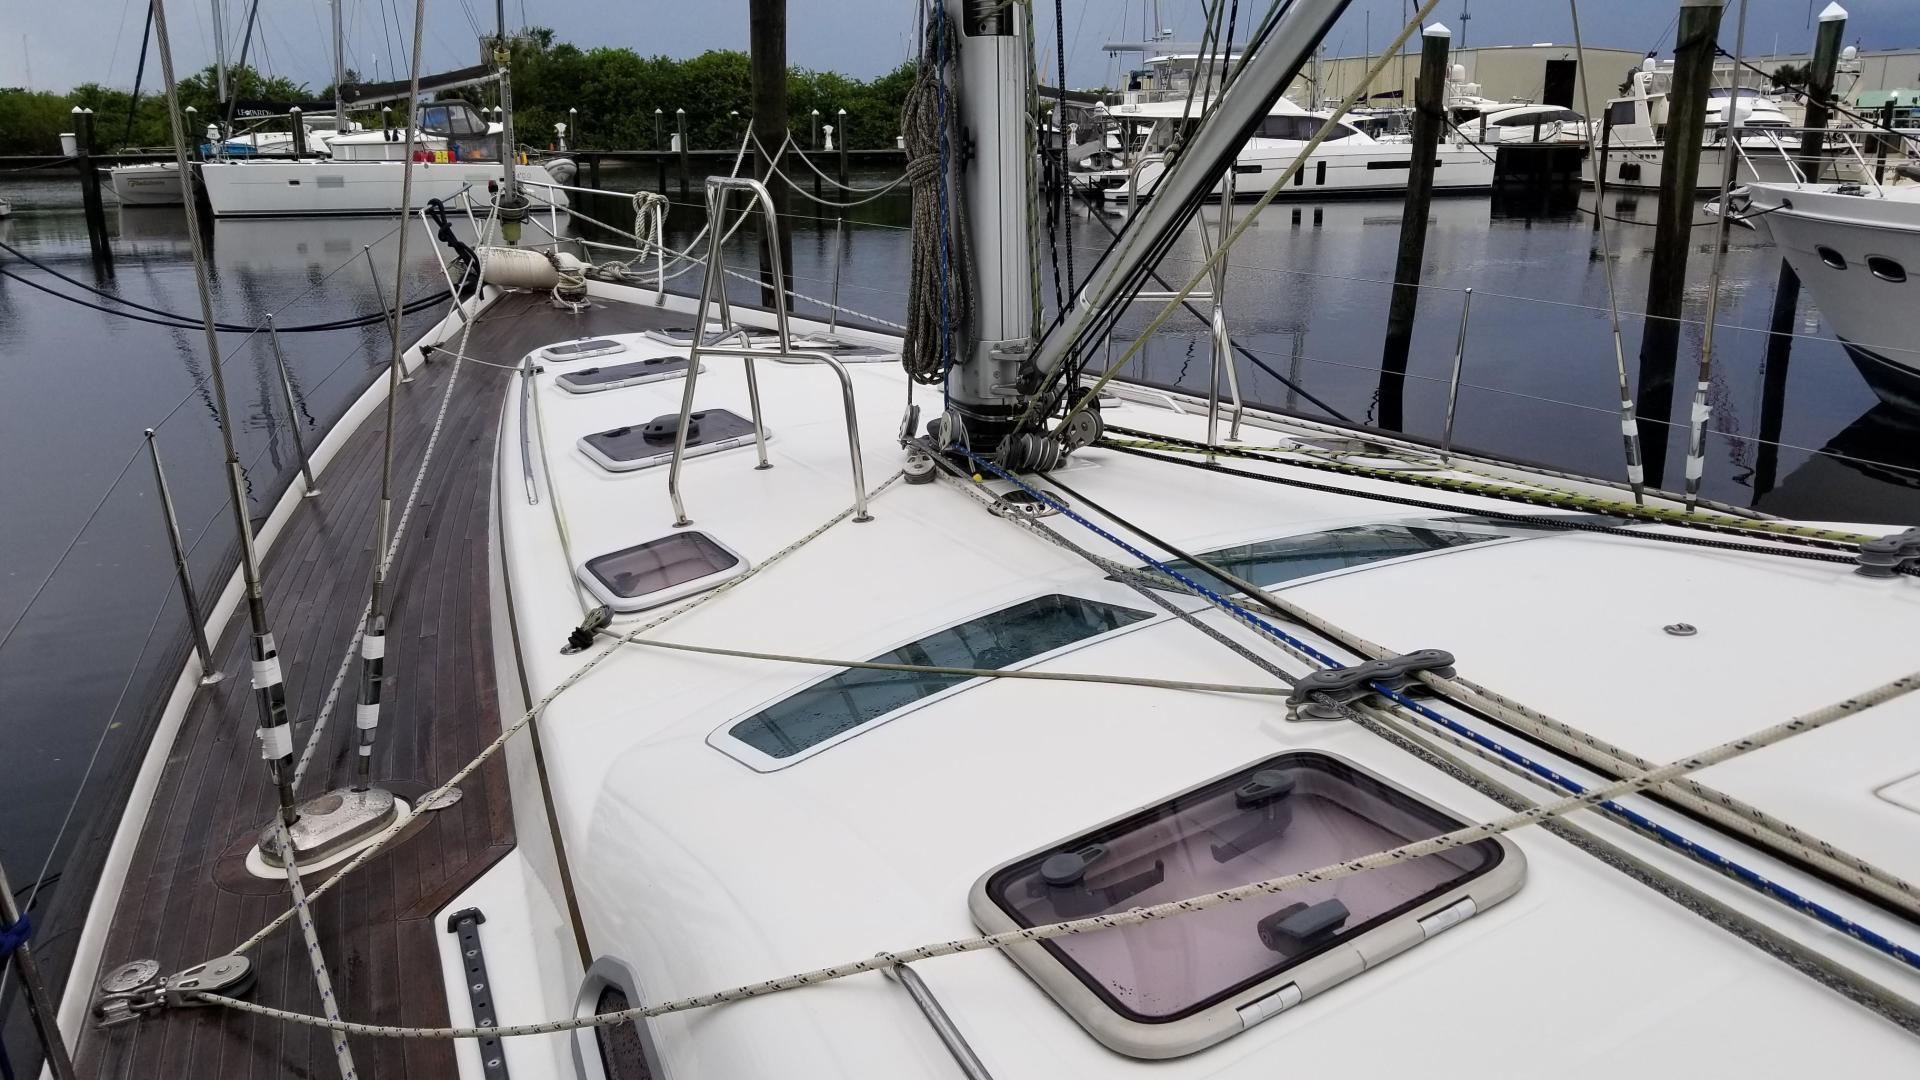 Beneteau-523 2007-FIRST LOVE Fort Pierce-Florida-United States-1427716 | Thumbnail